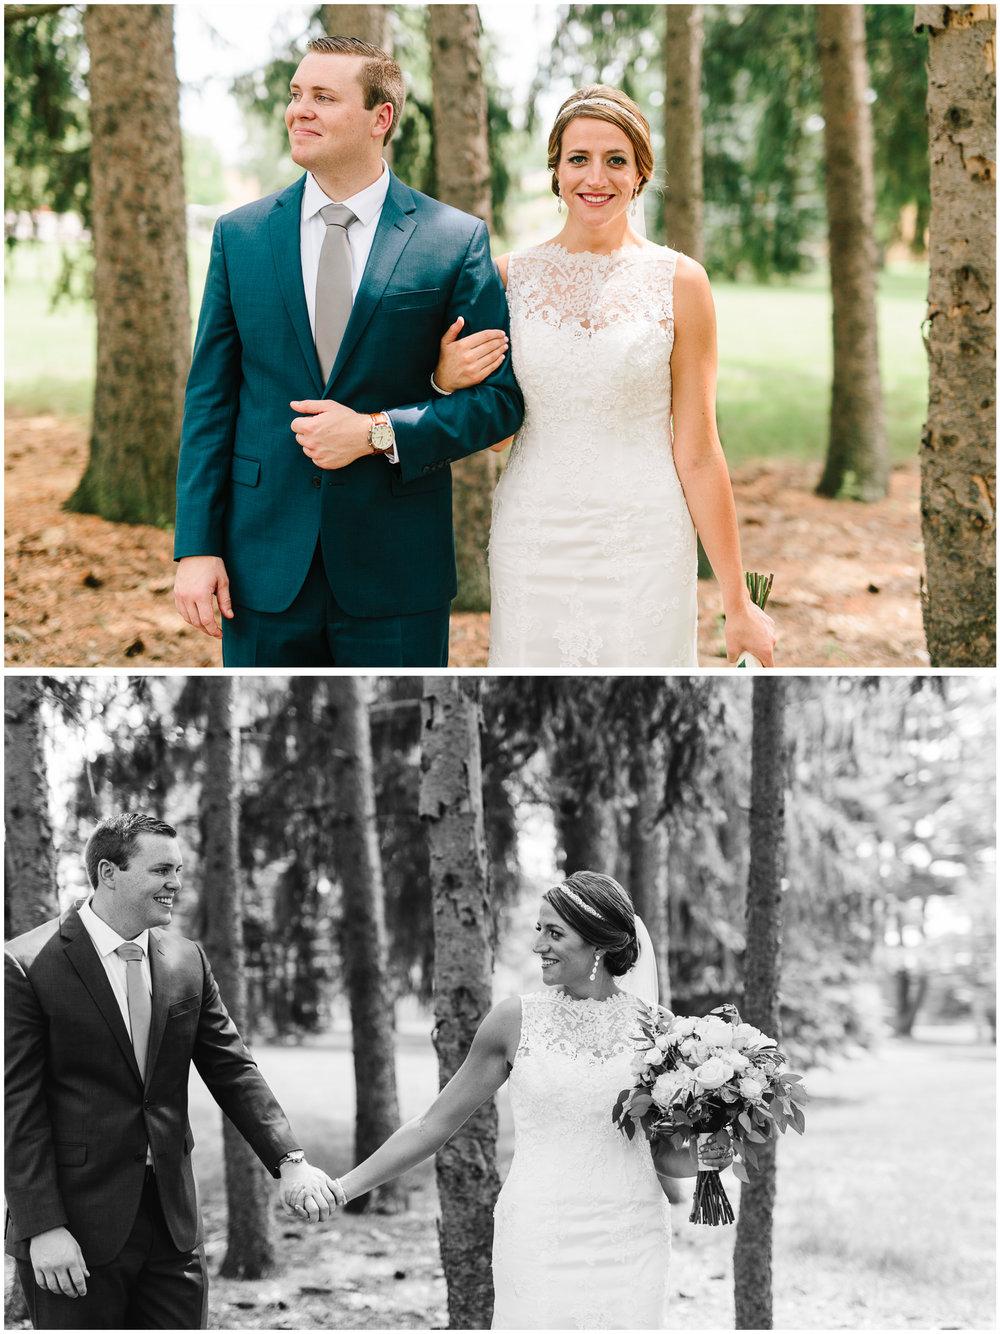 ann_arbor_michigan_wedding_43.jpg